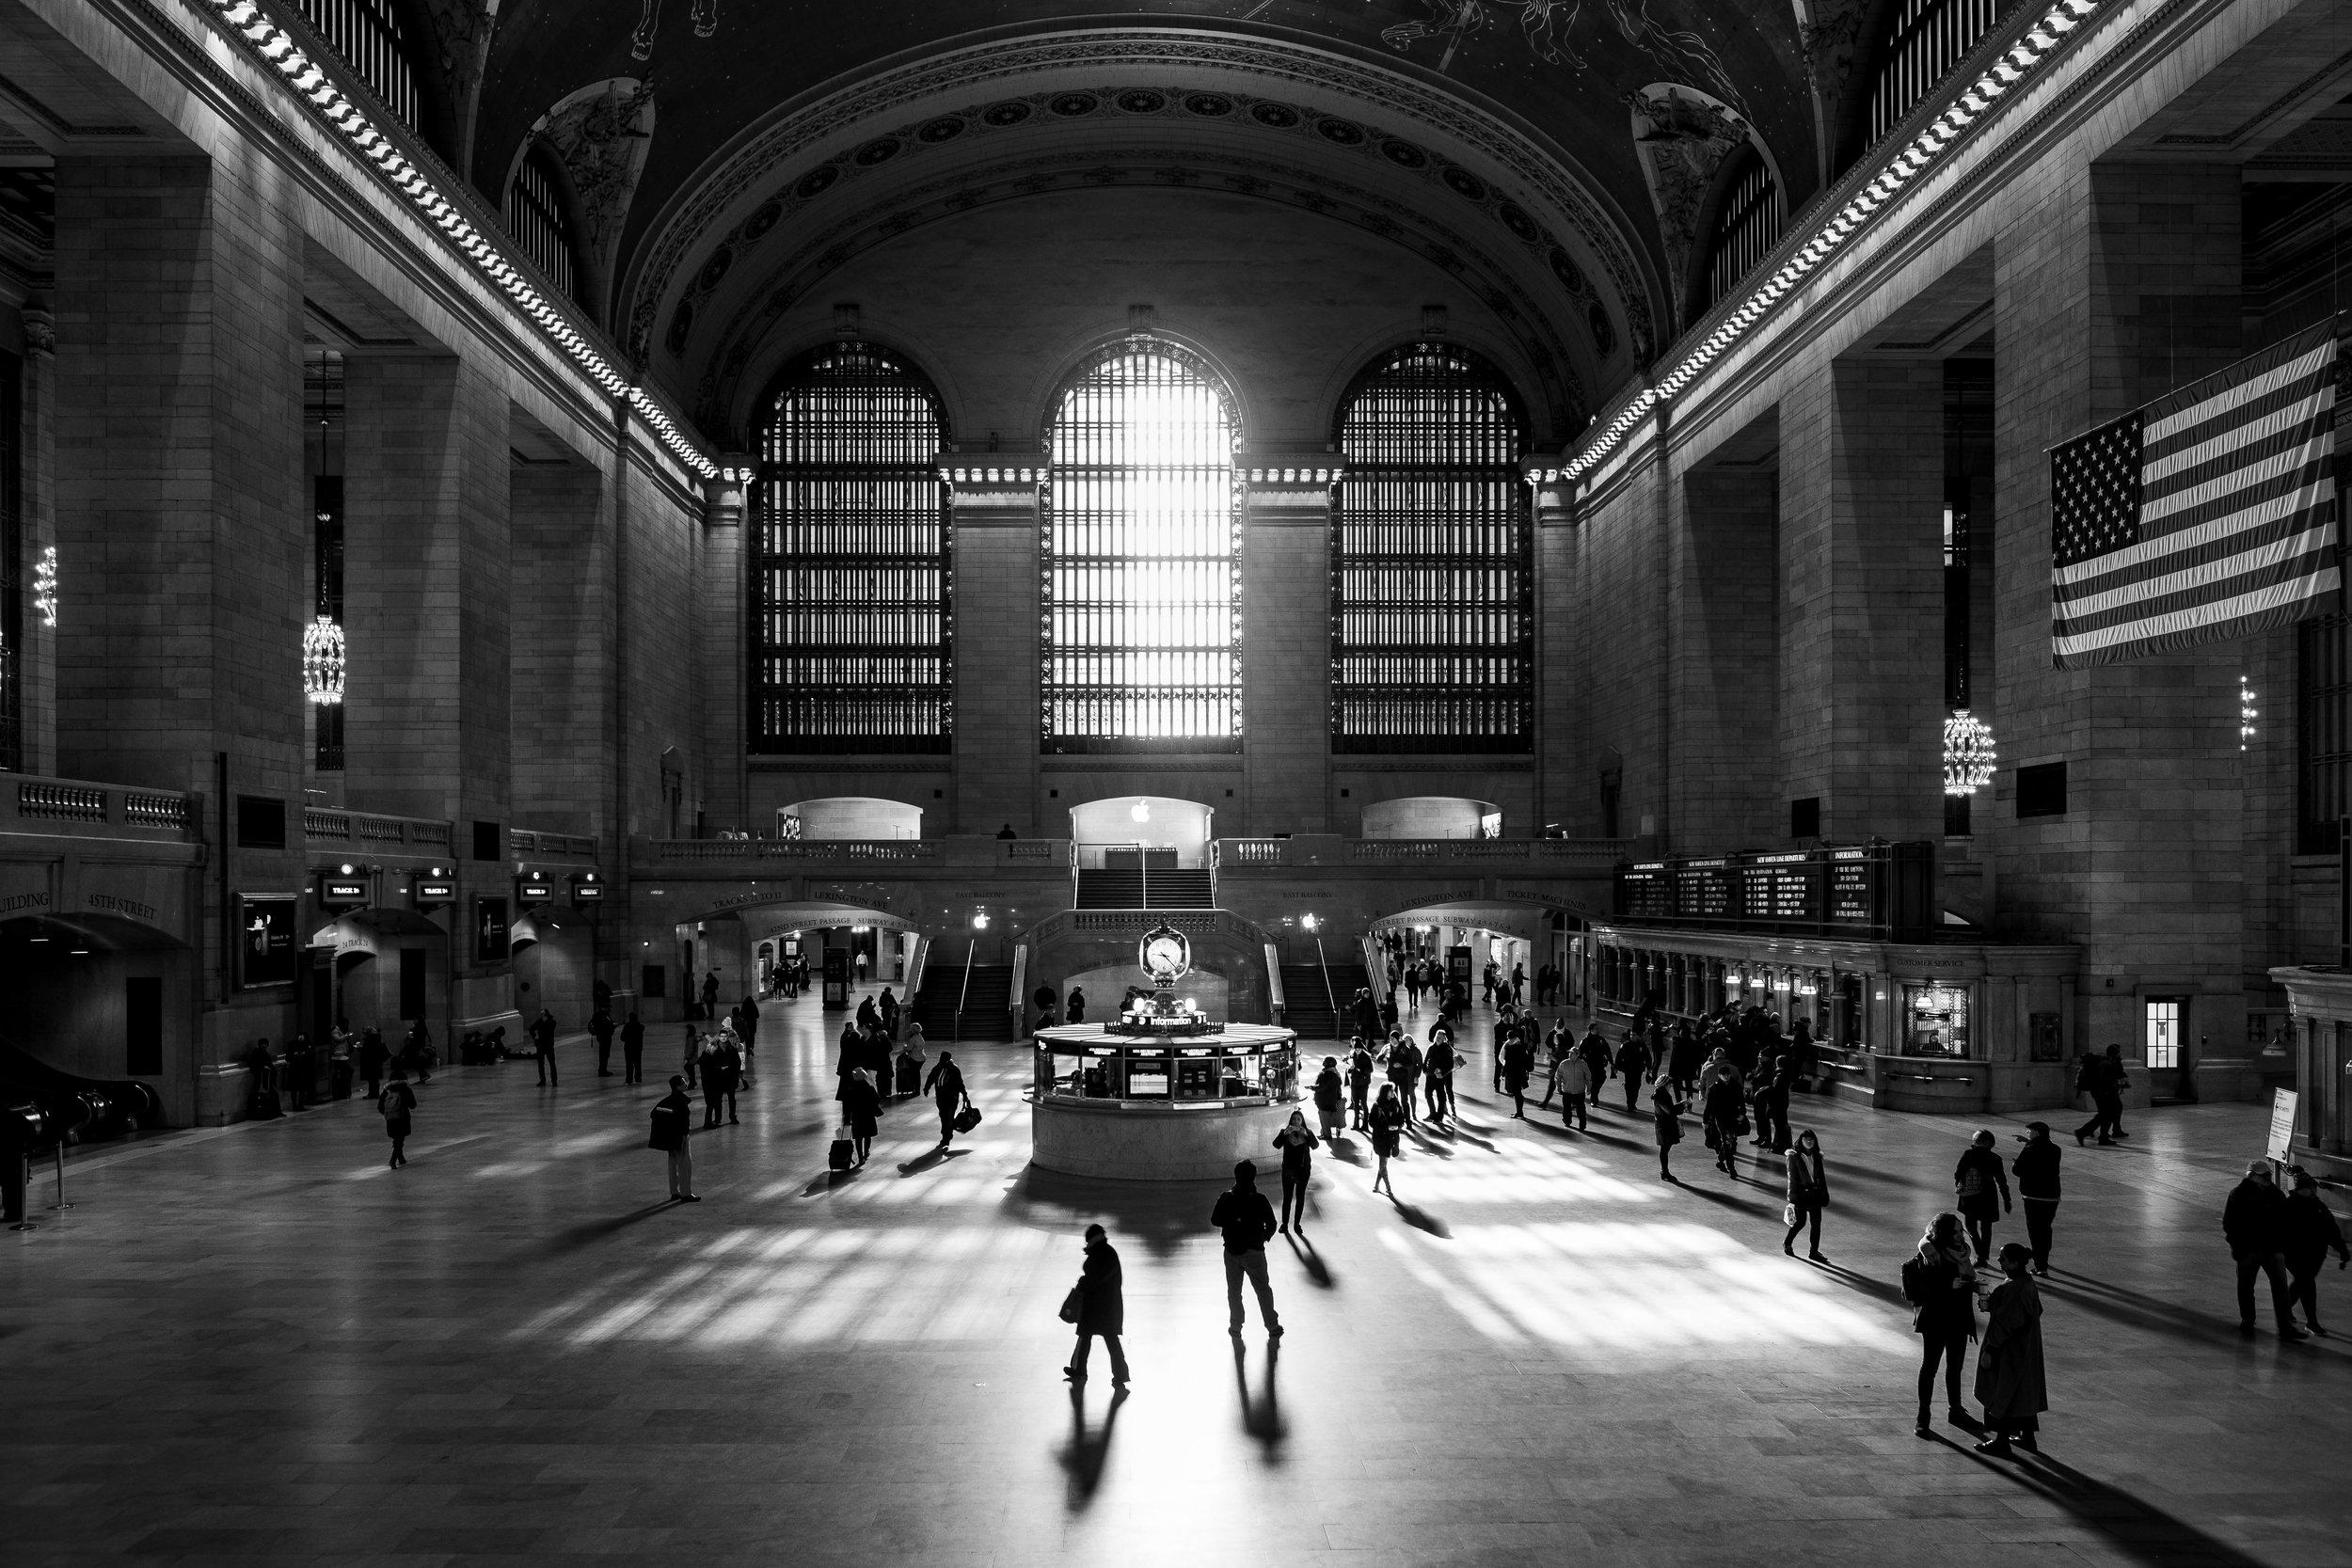 @christiannapolitano - Grand Central Station, New York, NY